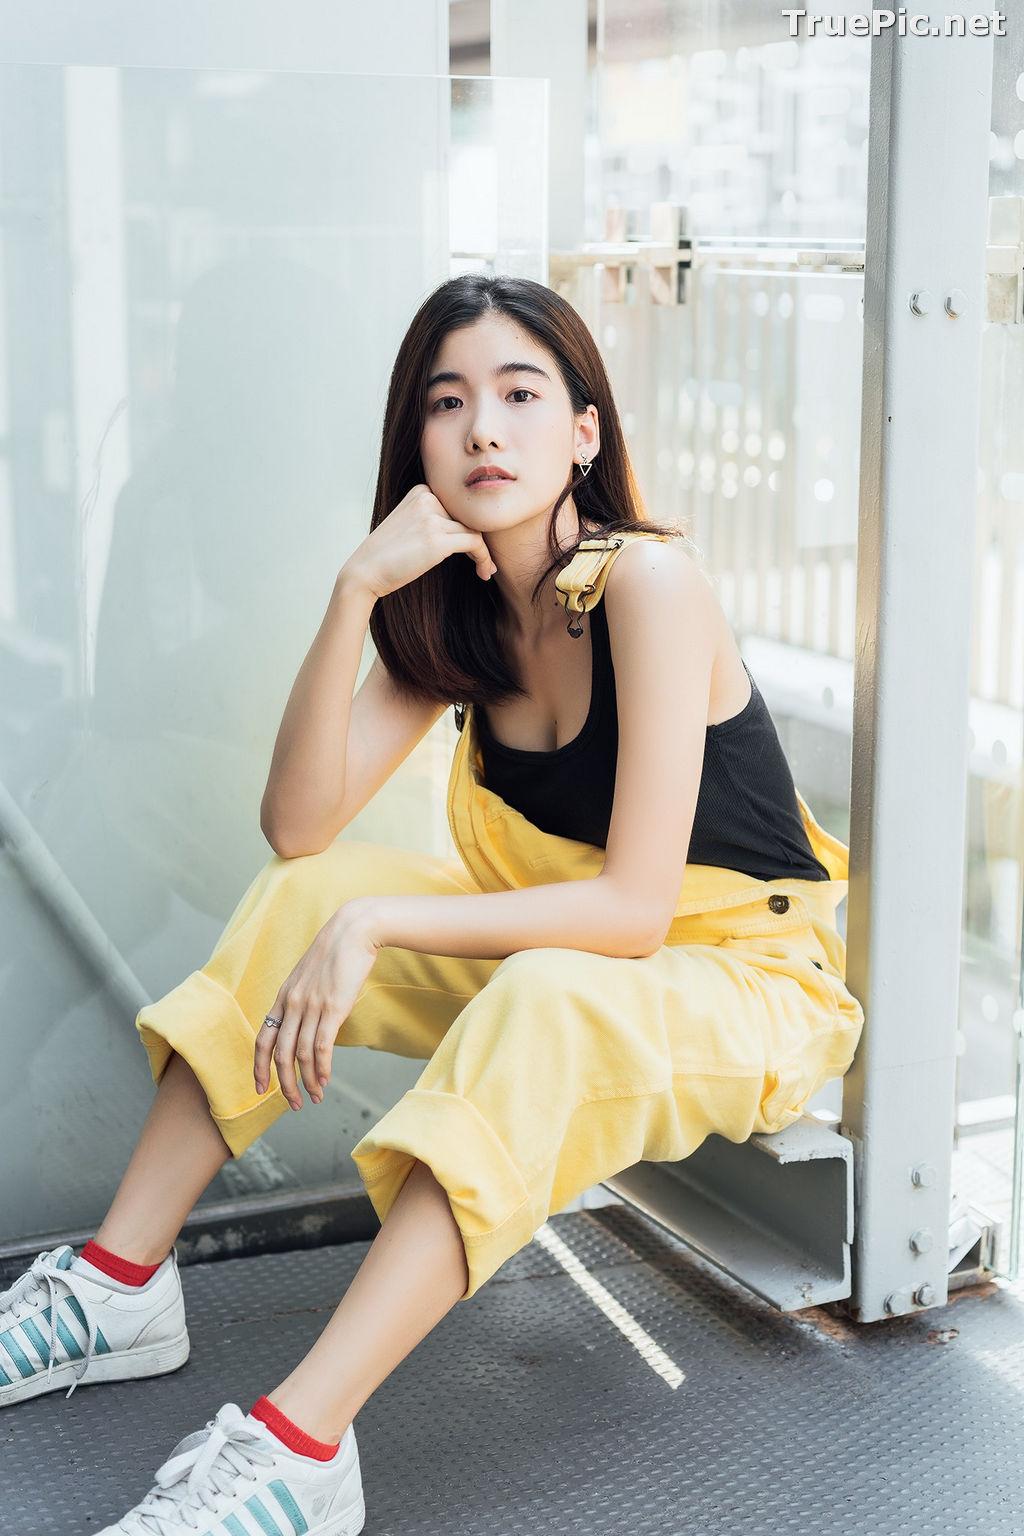 Image Thailand Model - Chanokneth Yospanya - Love Minions - TruePic.net - Picture-3